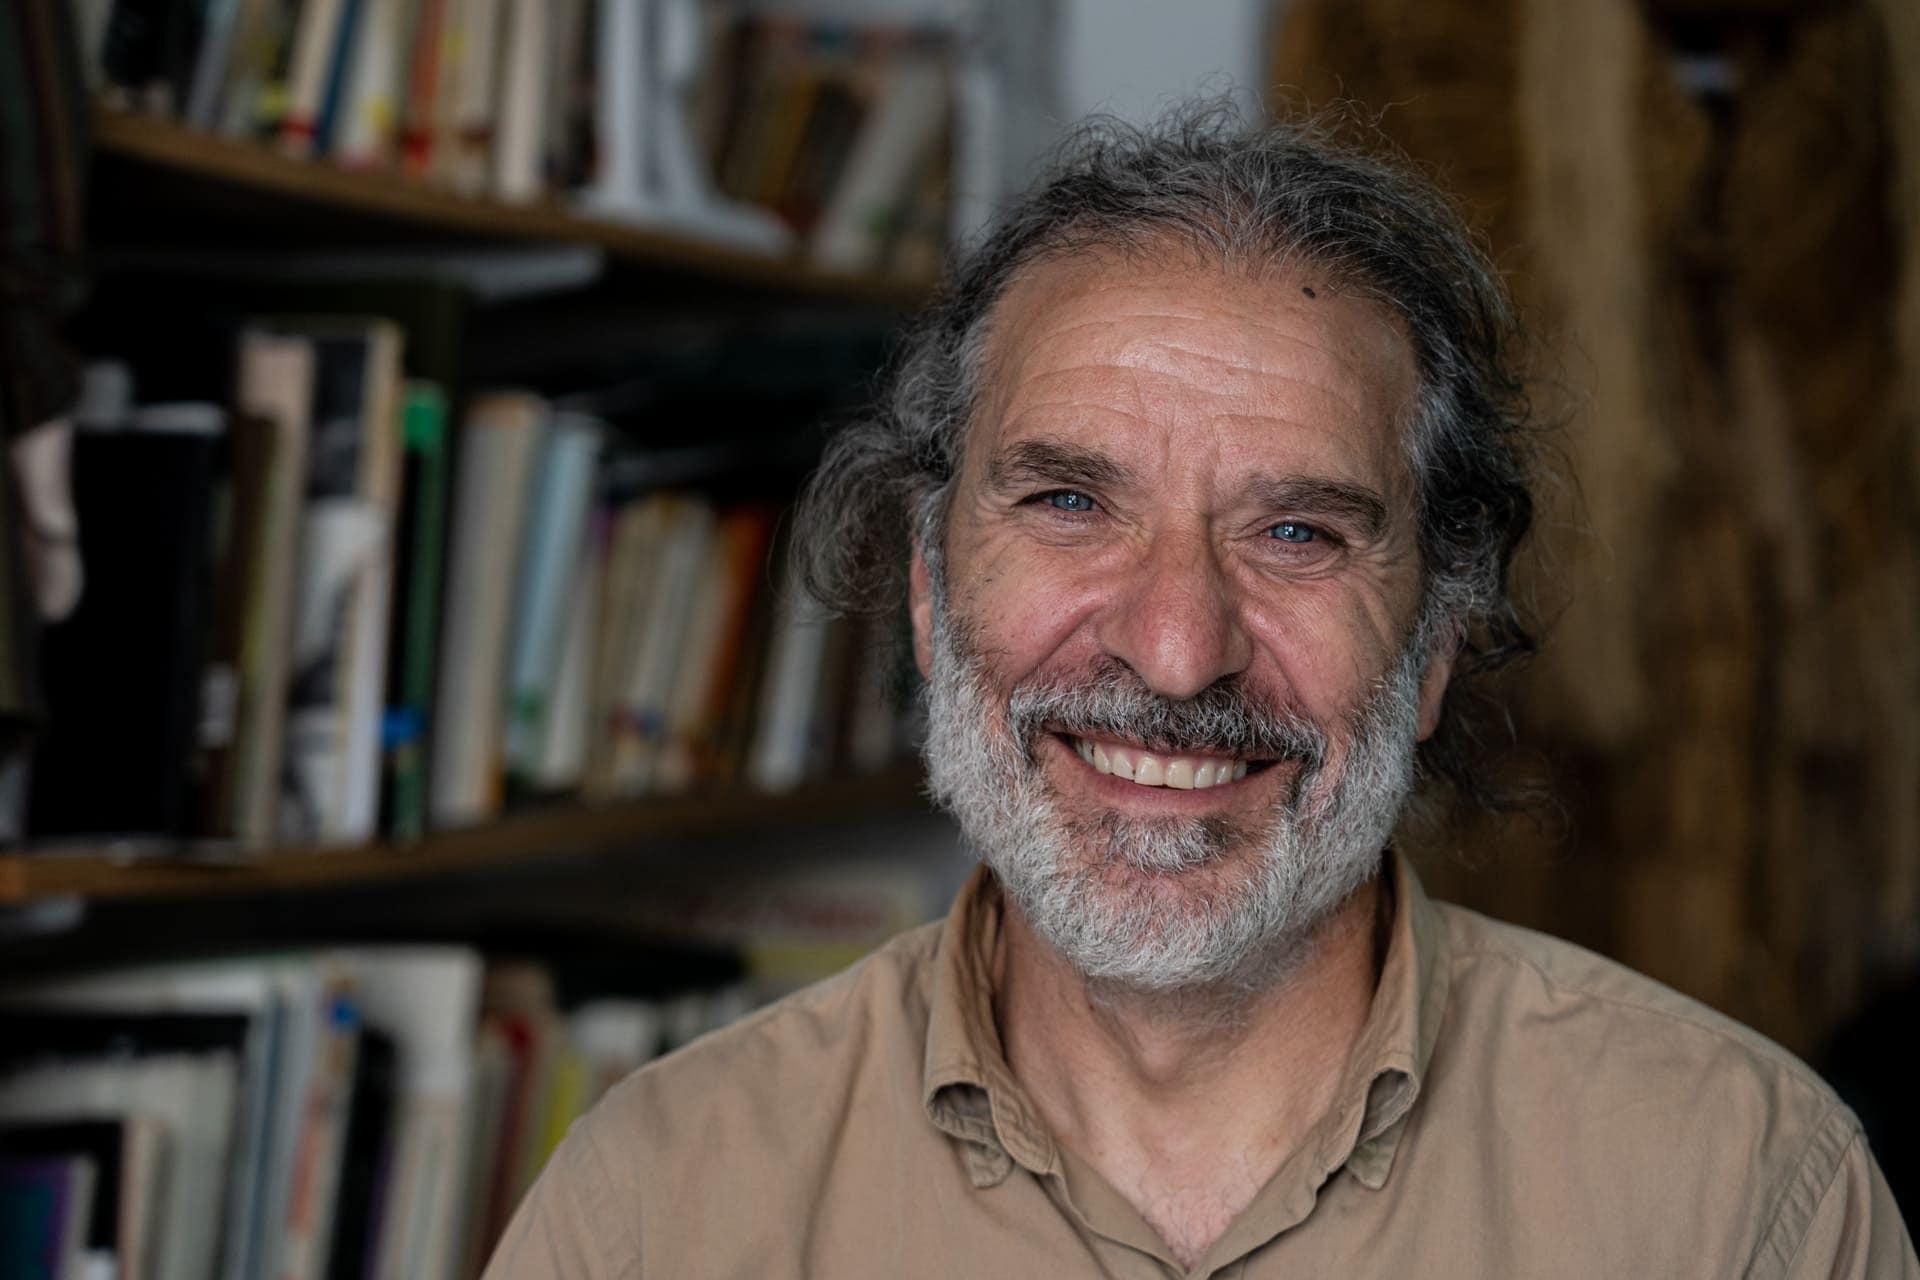 Eduardo Correia, Teatro do Montemuro